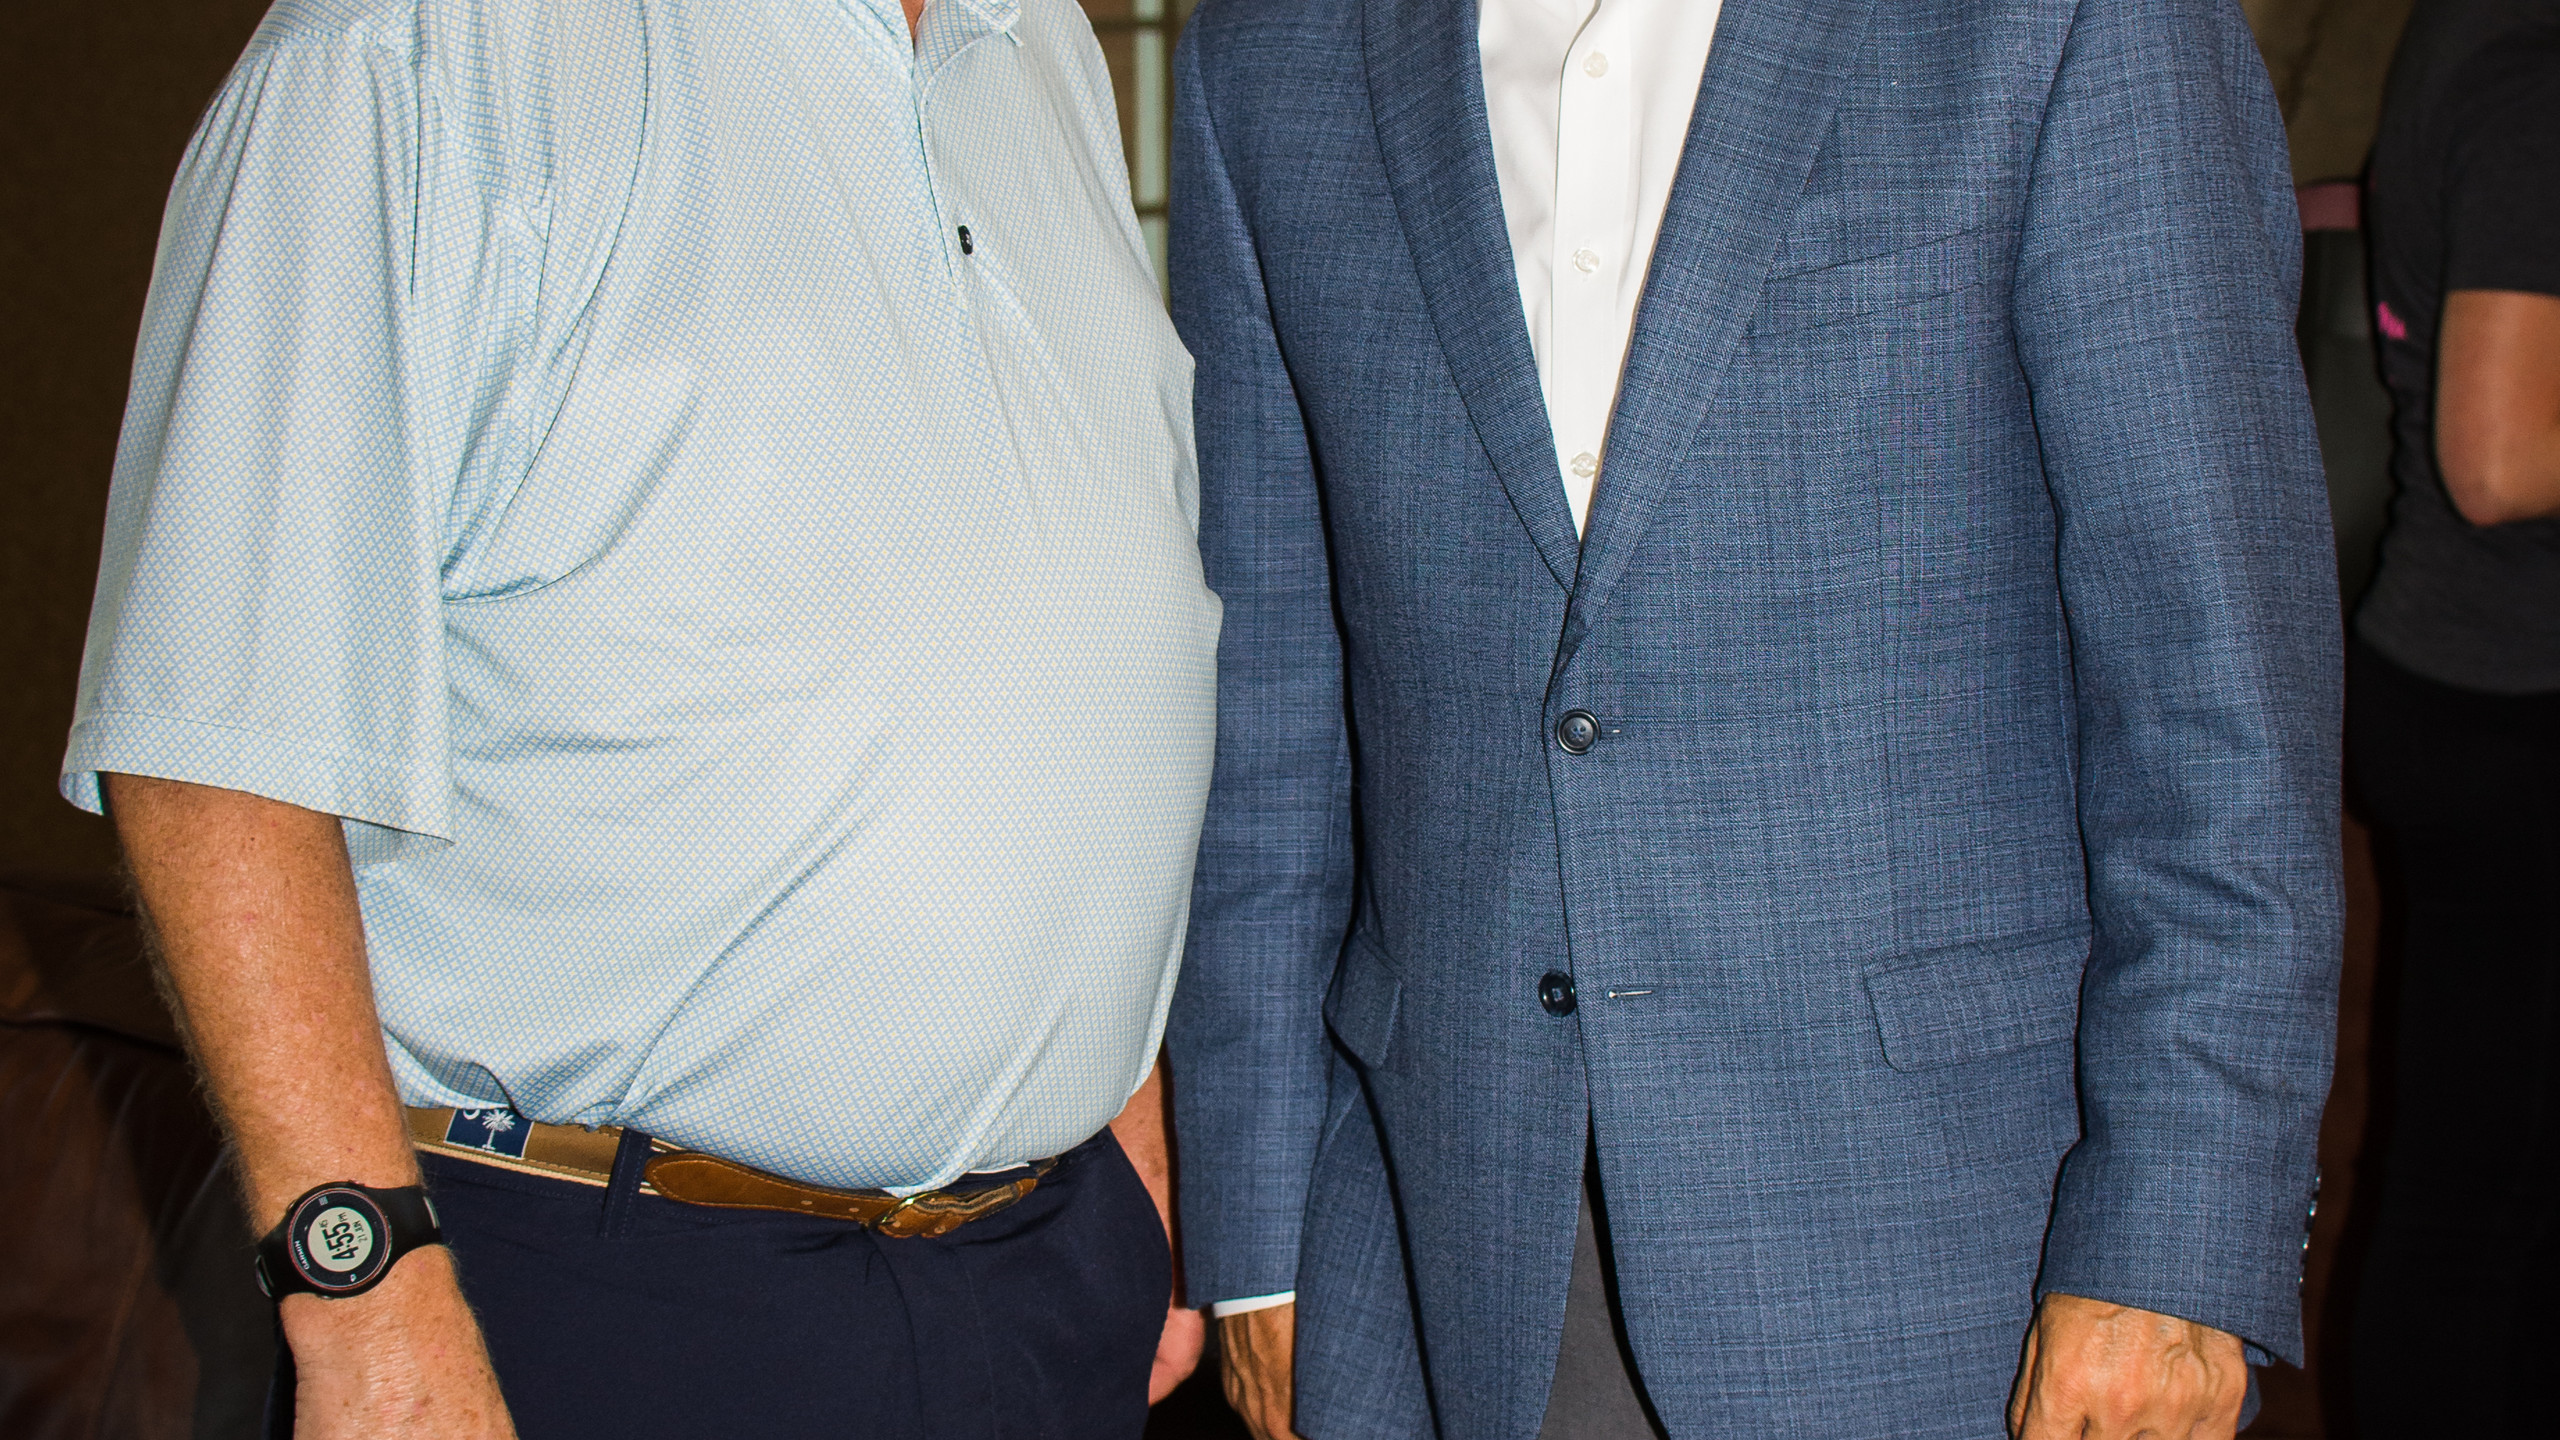 Cecil Morgan and Charlie Koon